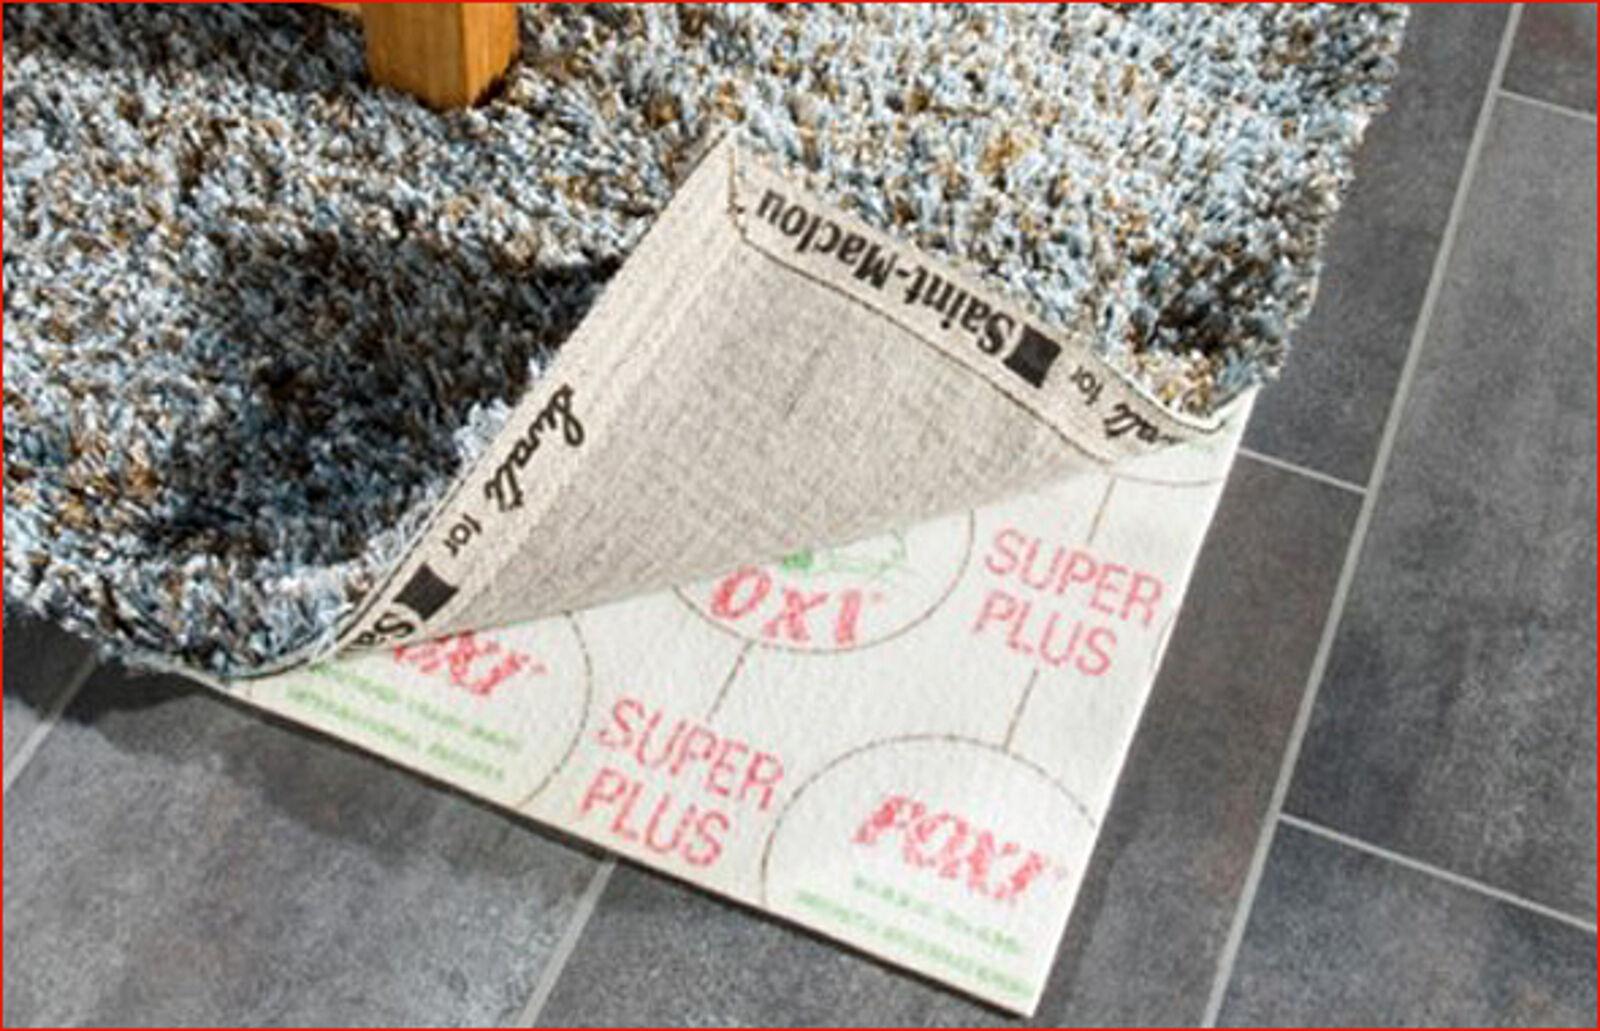 FOXI SUPER PLUS Gipper Stop glisse Tapis Anti Fluage Tapis glisse Thibaude Tapis Stratifié 9c329f